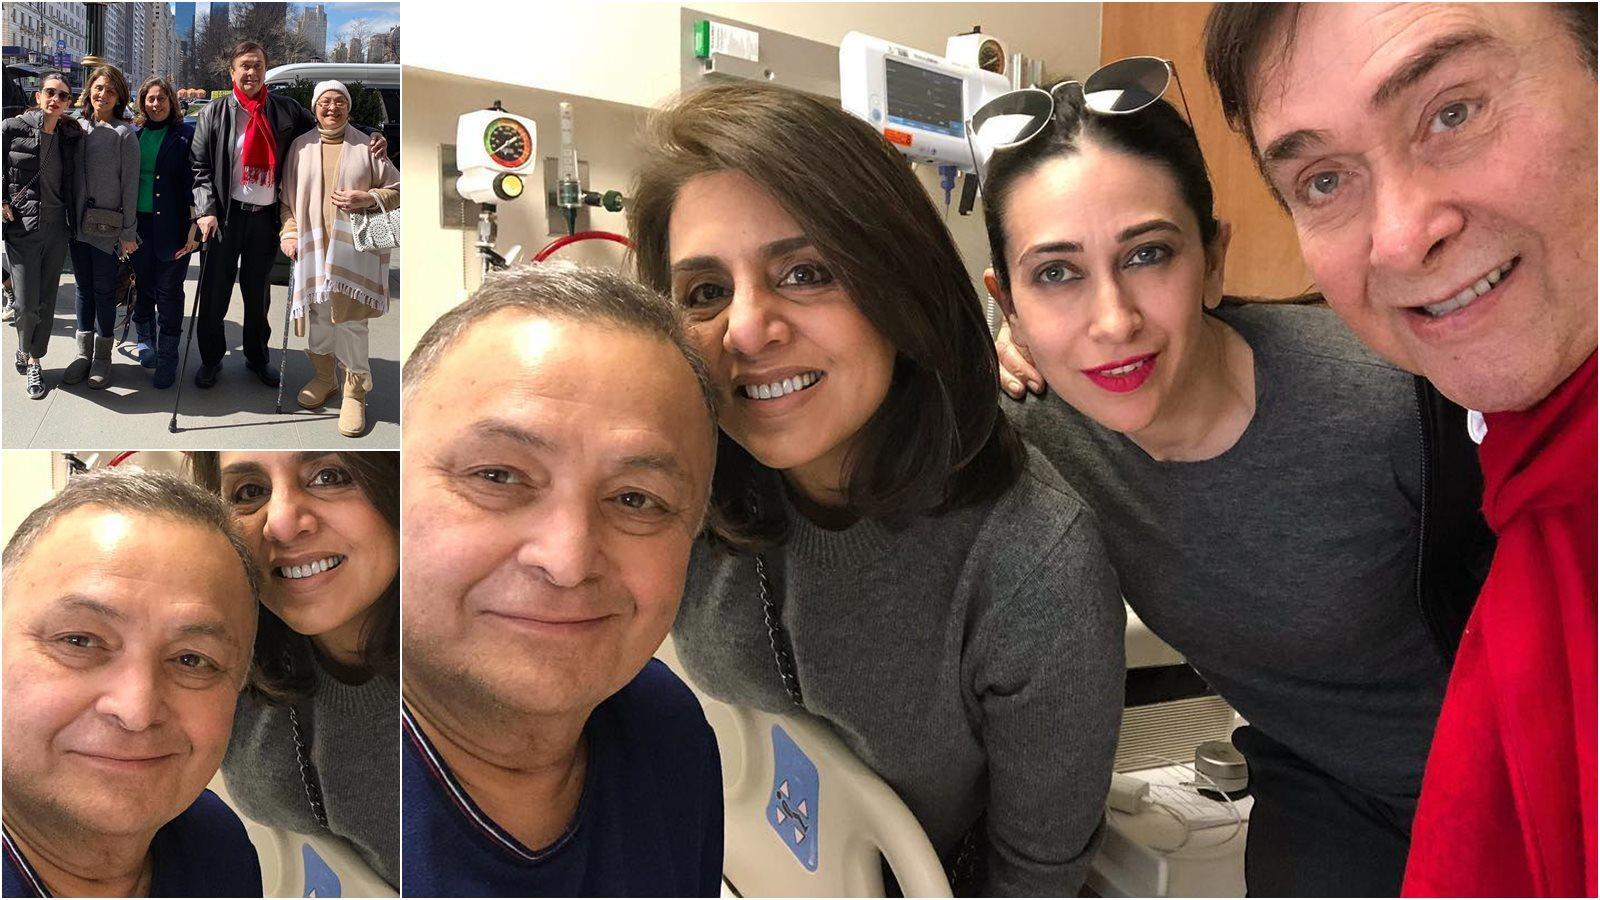 karisma-kapoor-randhir-kapoor-visit-rishi-kapoor-in-new-york-neetu-kapoor-shares-happy-selfie